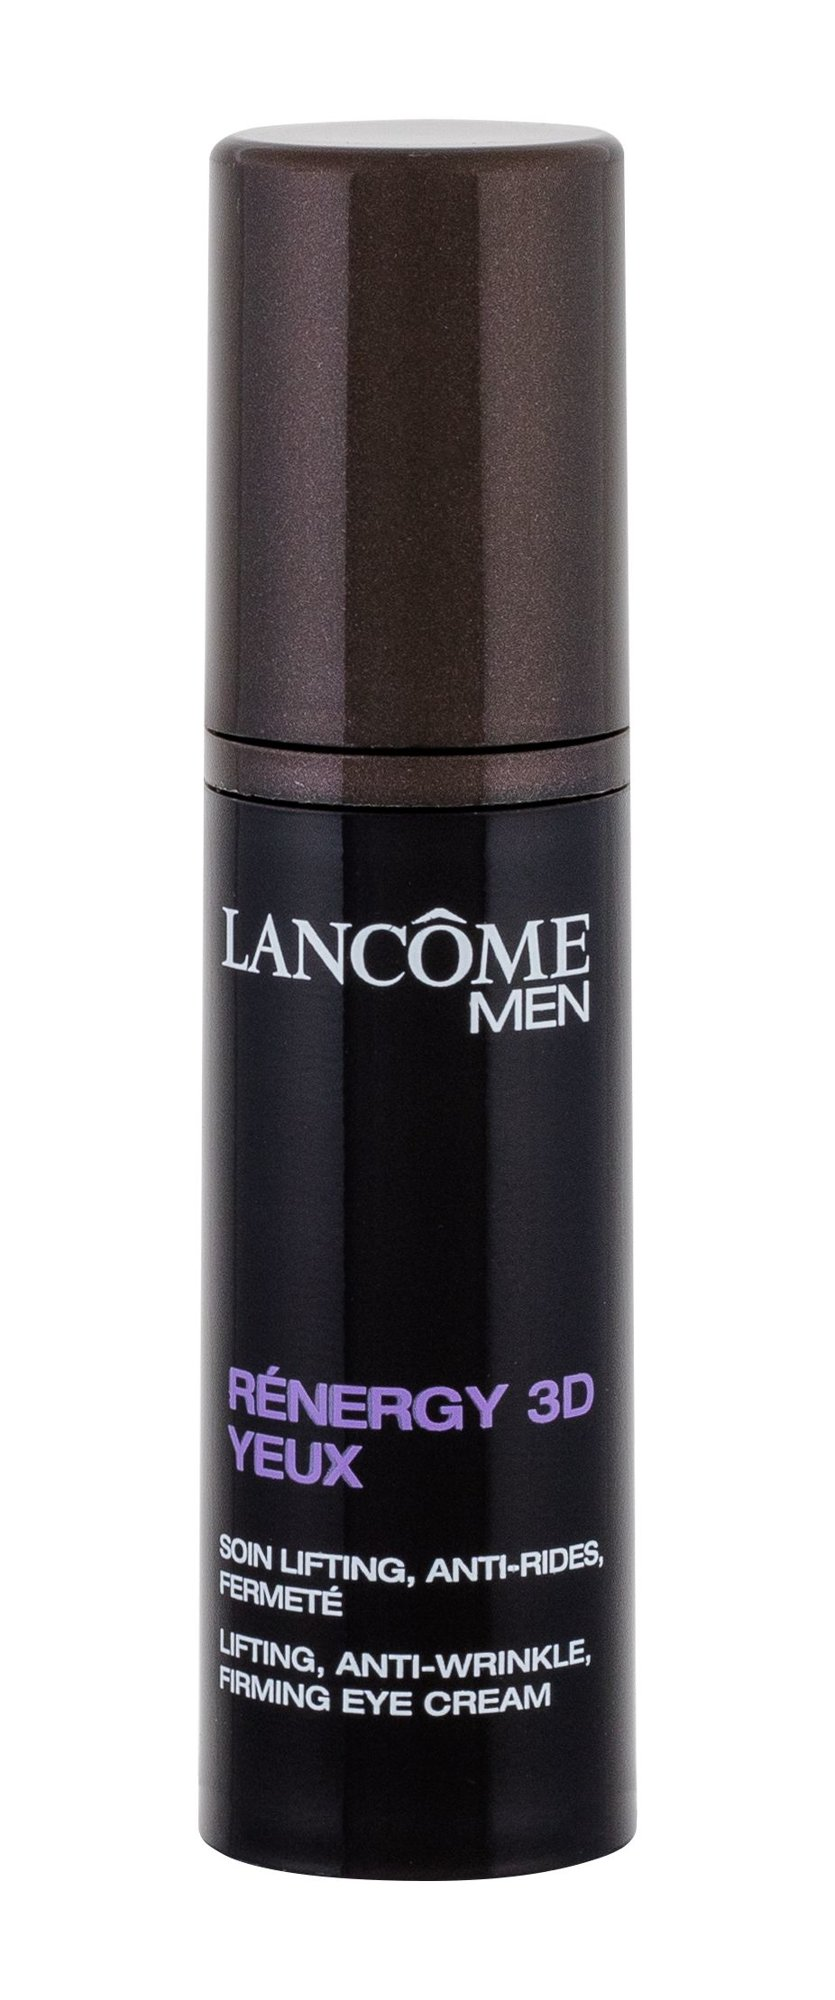 Lancôme Men Rénergy 3D Cosmetic 15ml